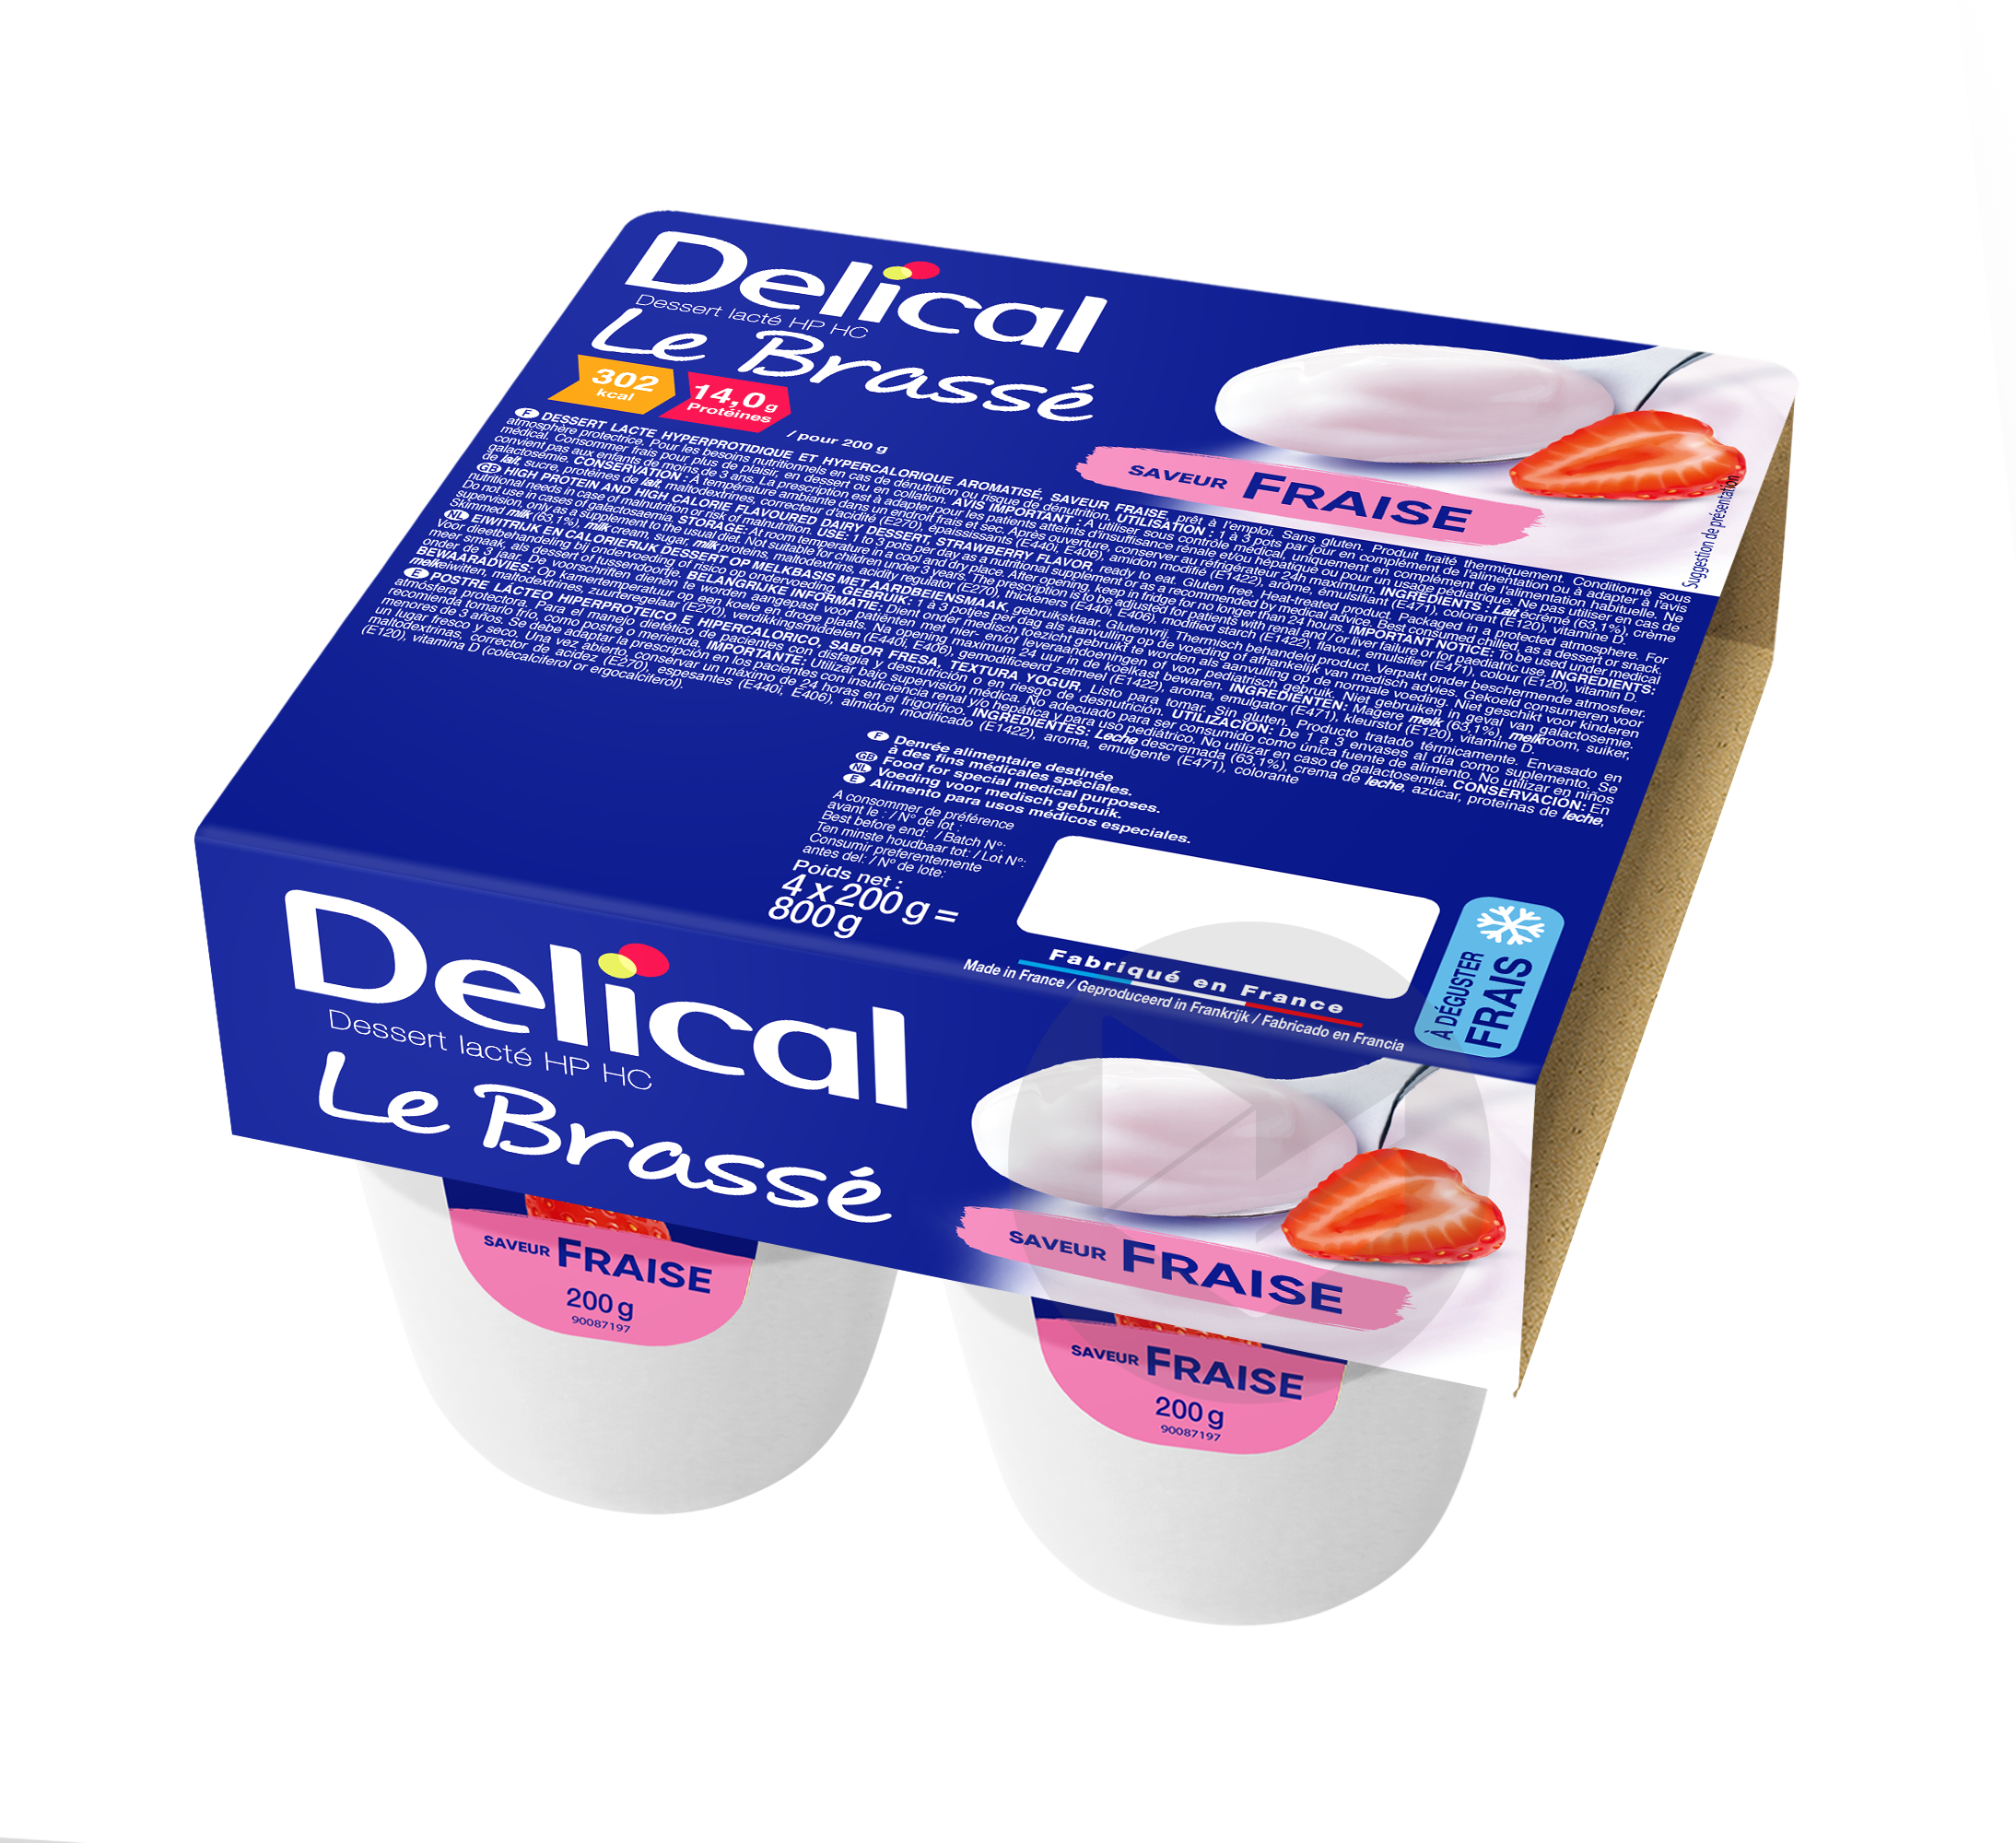 Delical Le Brasse Hp Hc Fraise